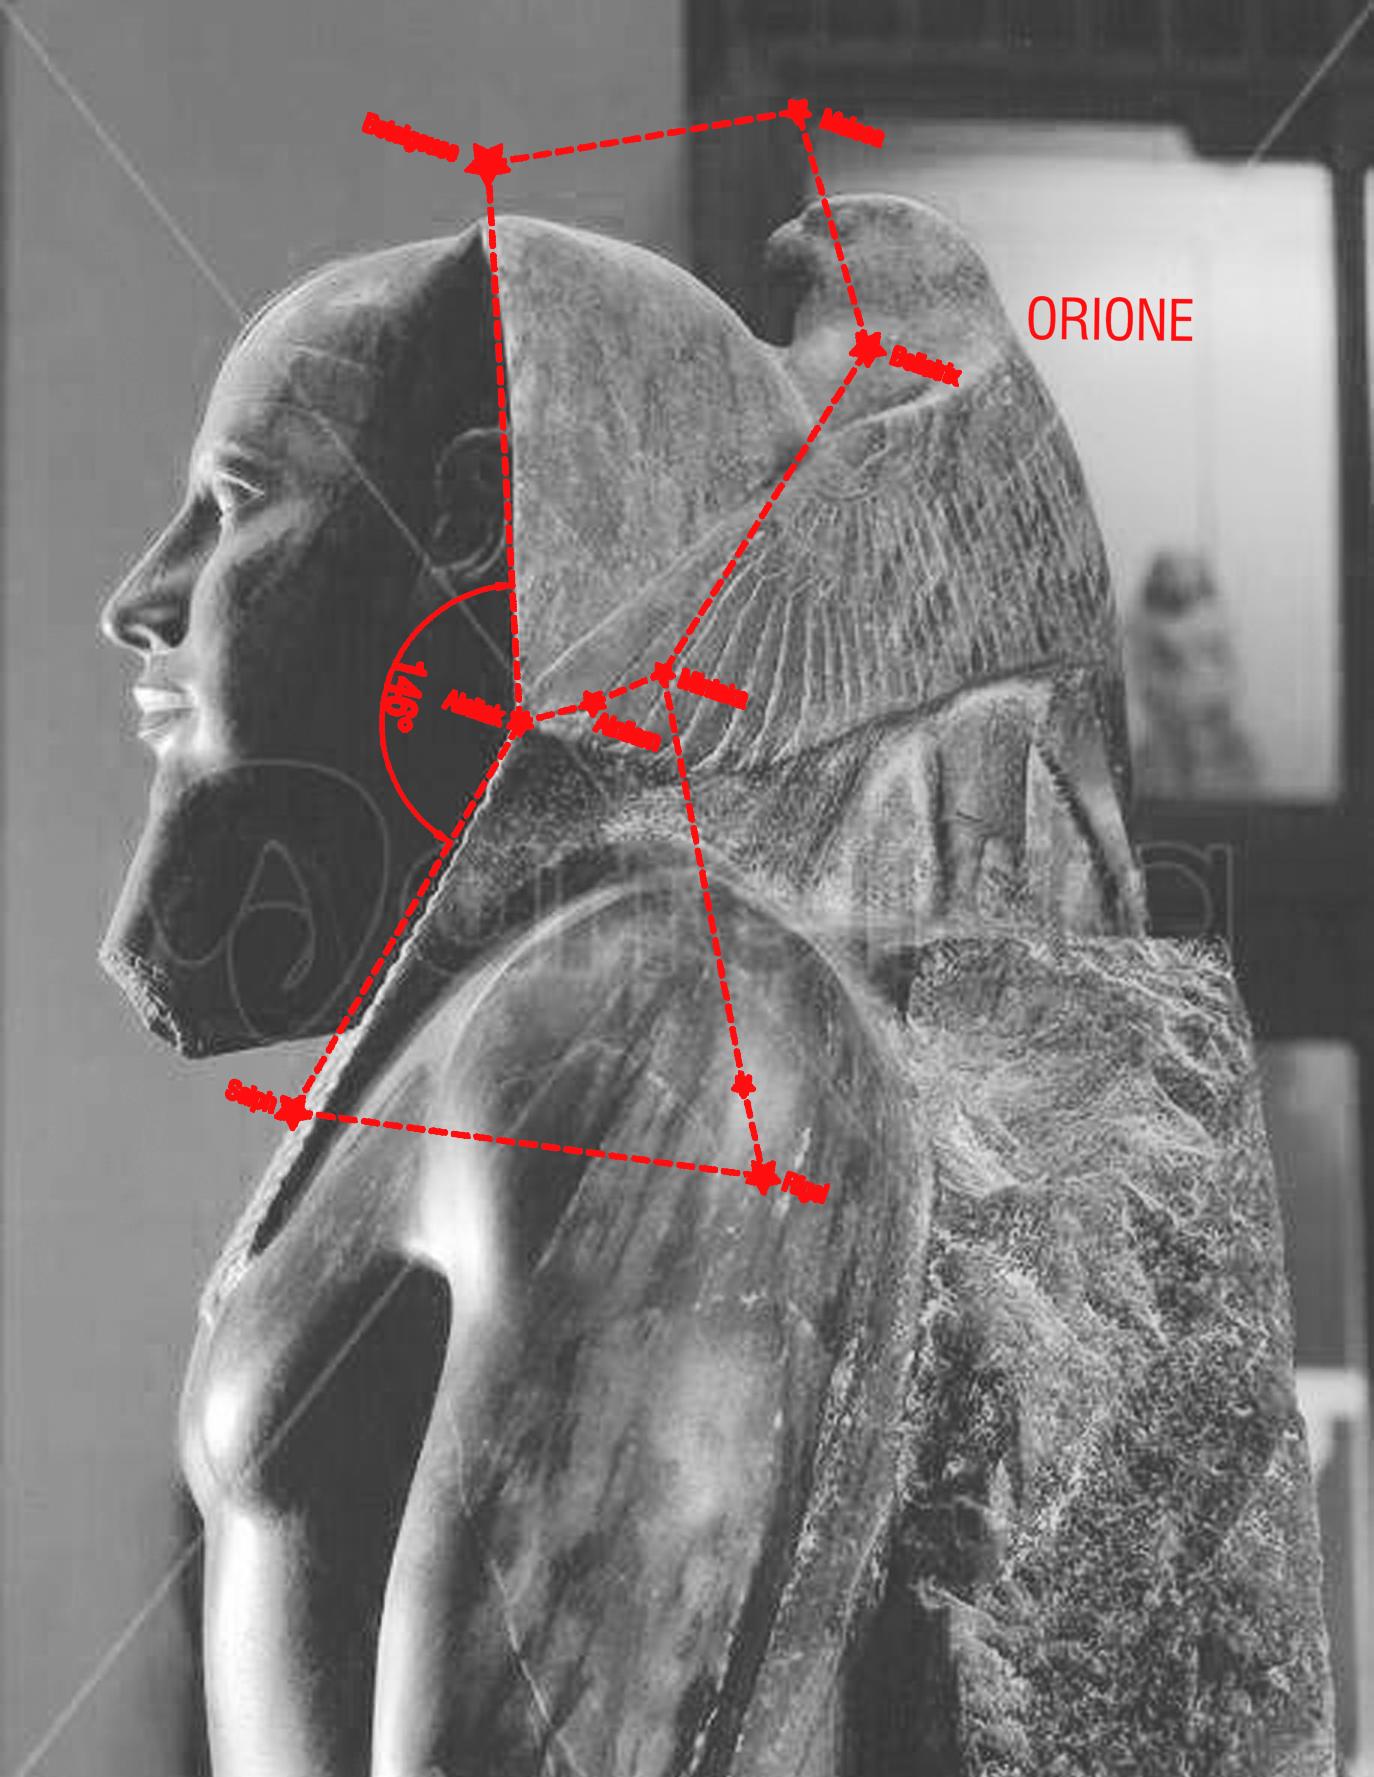 C:\Users\Utente\Pictures\1. The Snefru Gallery\orion code\khefren - menkaure - red pyramid - meidum - neferikara - orion\KHEFREN PROFILE-ORION.jpg